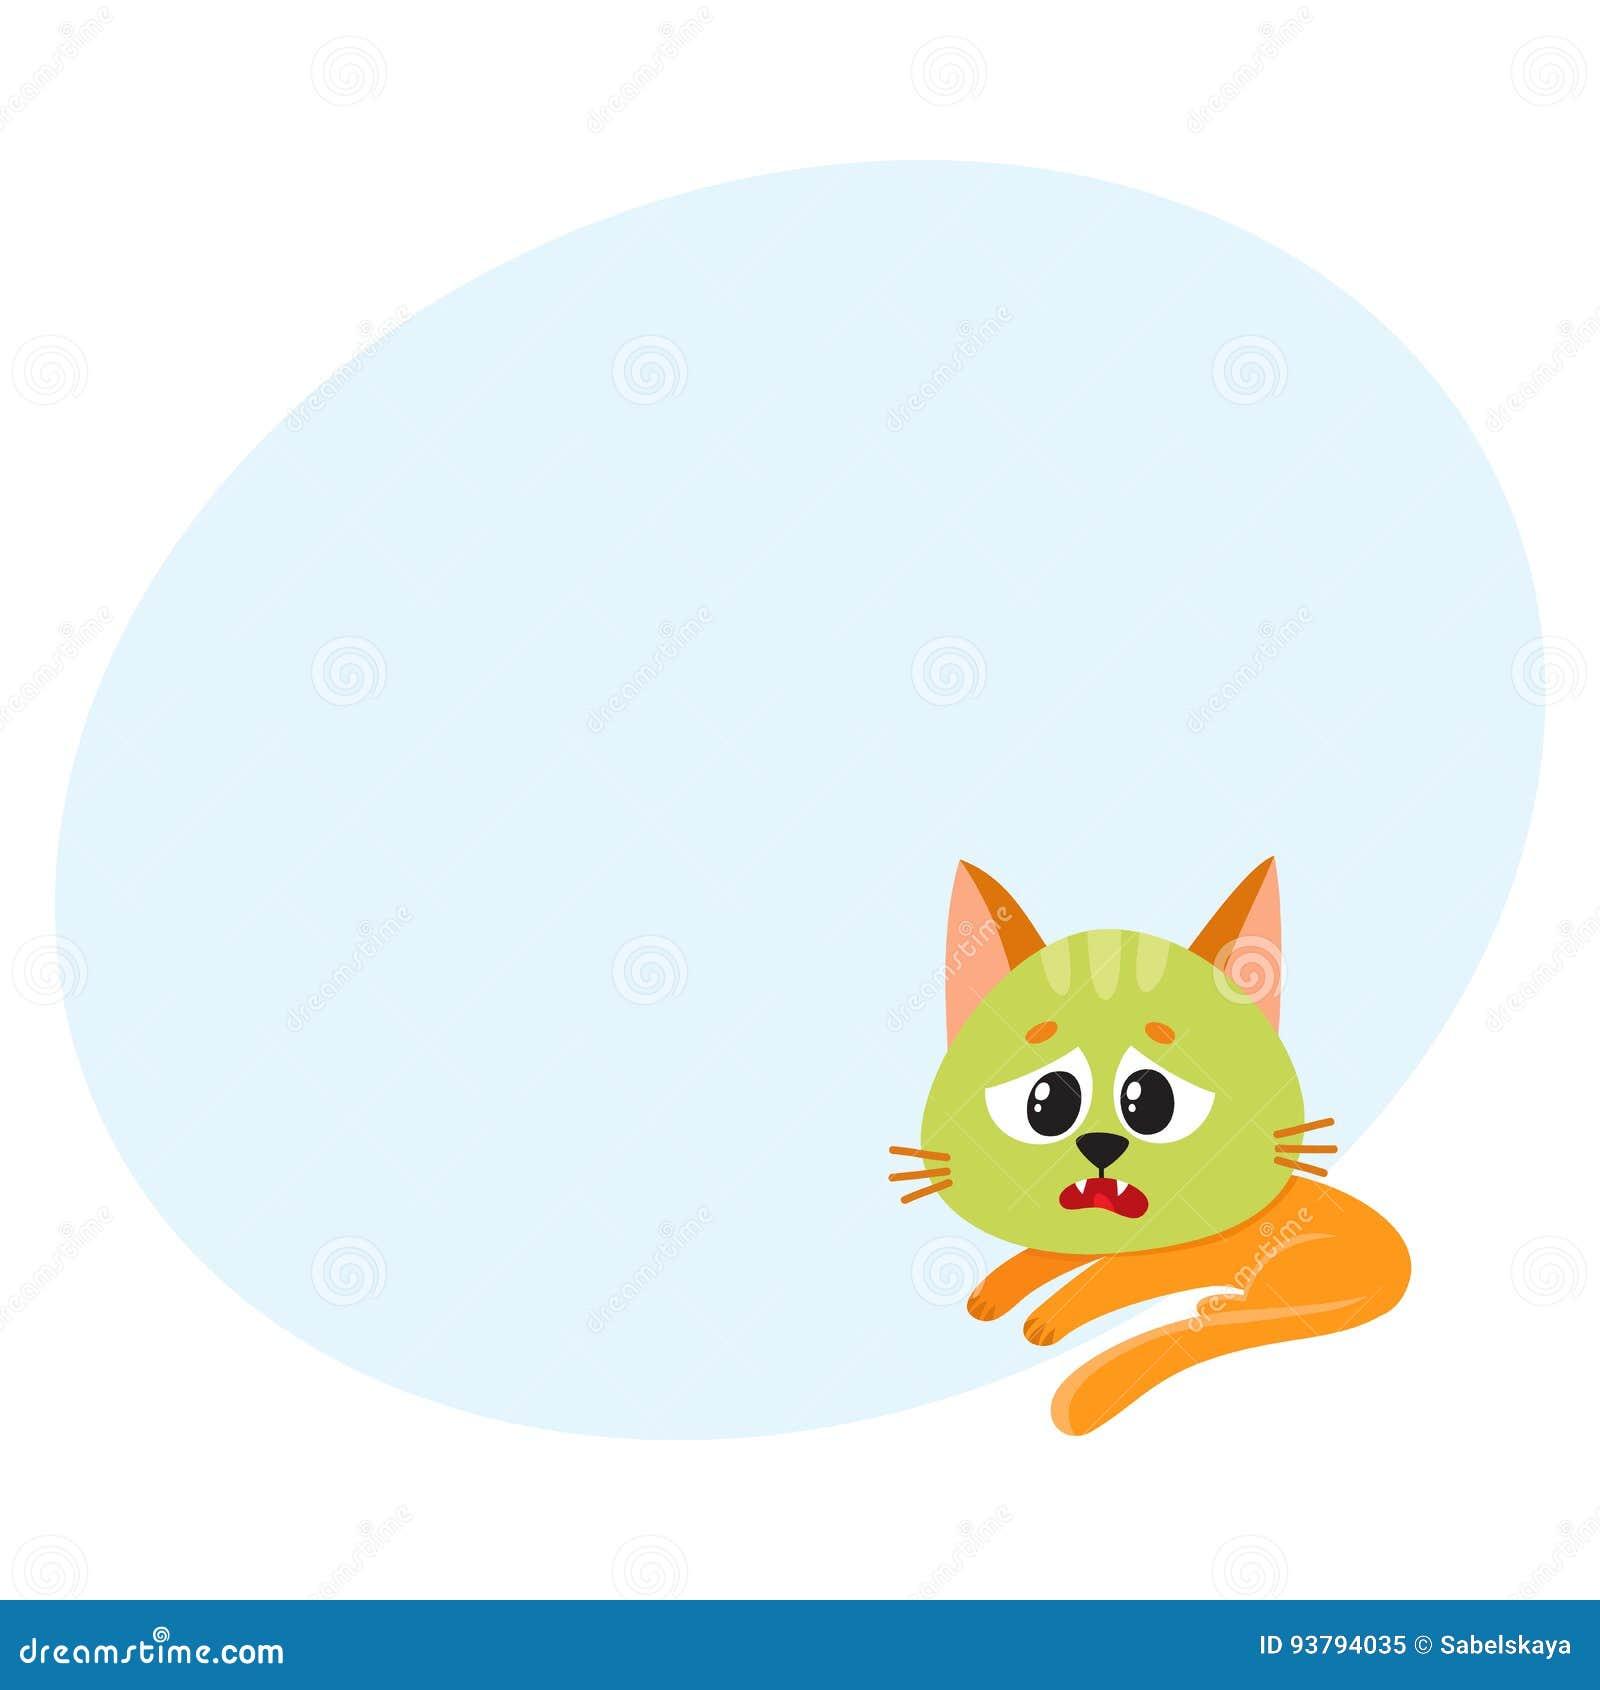 Katze Das Kätzchen Das Krank Sich Fühlt Um Zu Vertragen Grünen